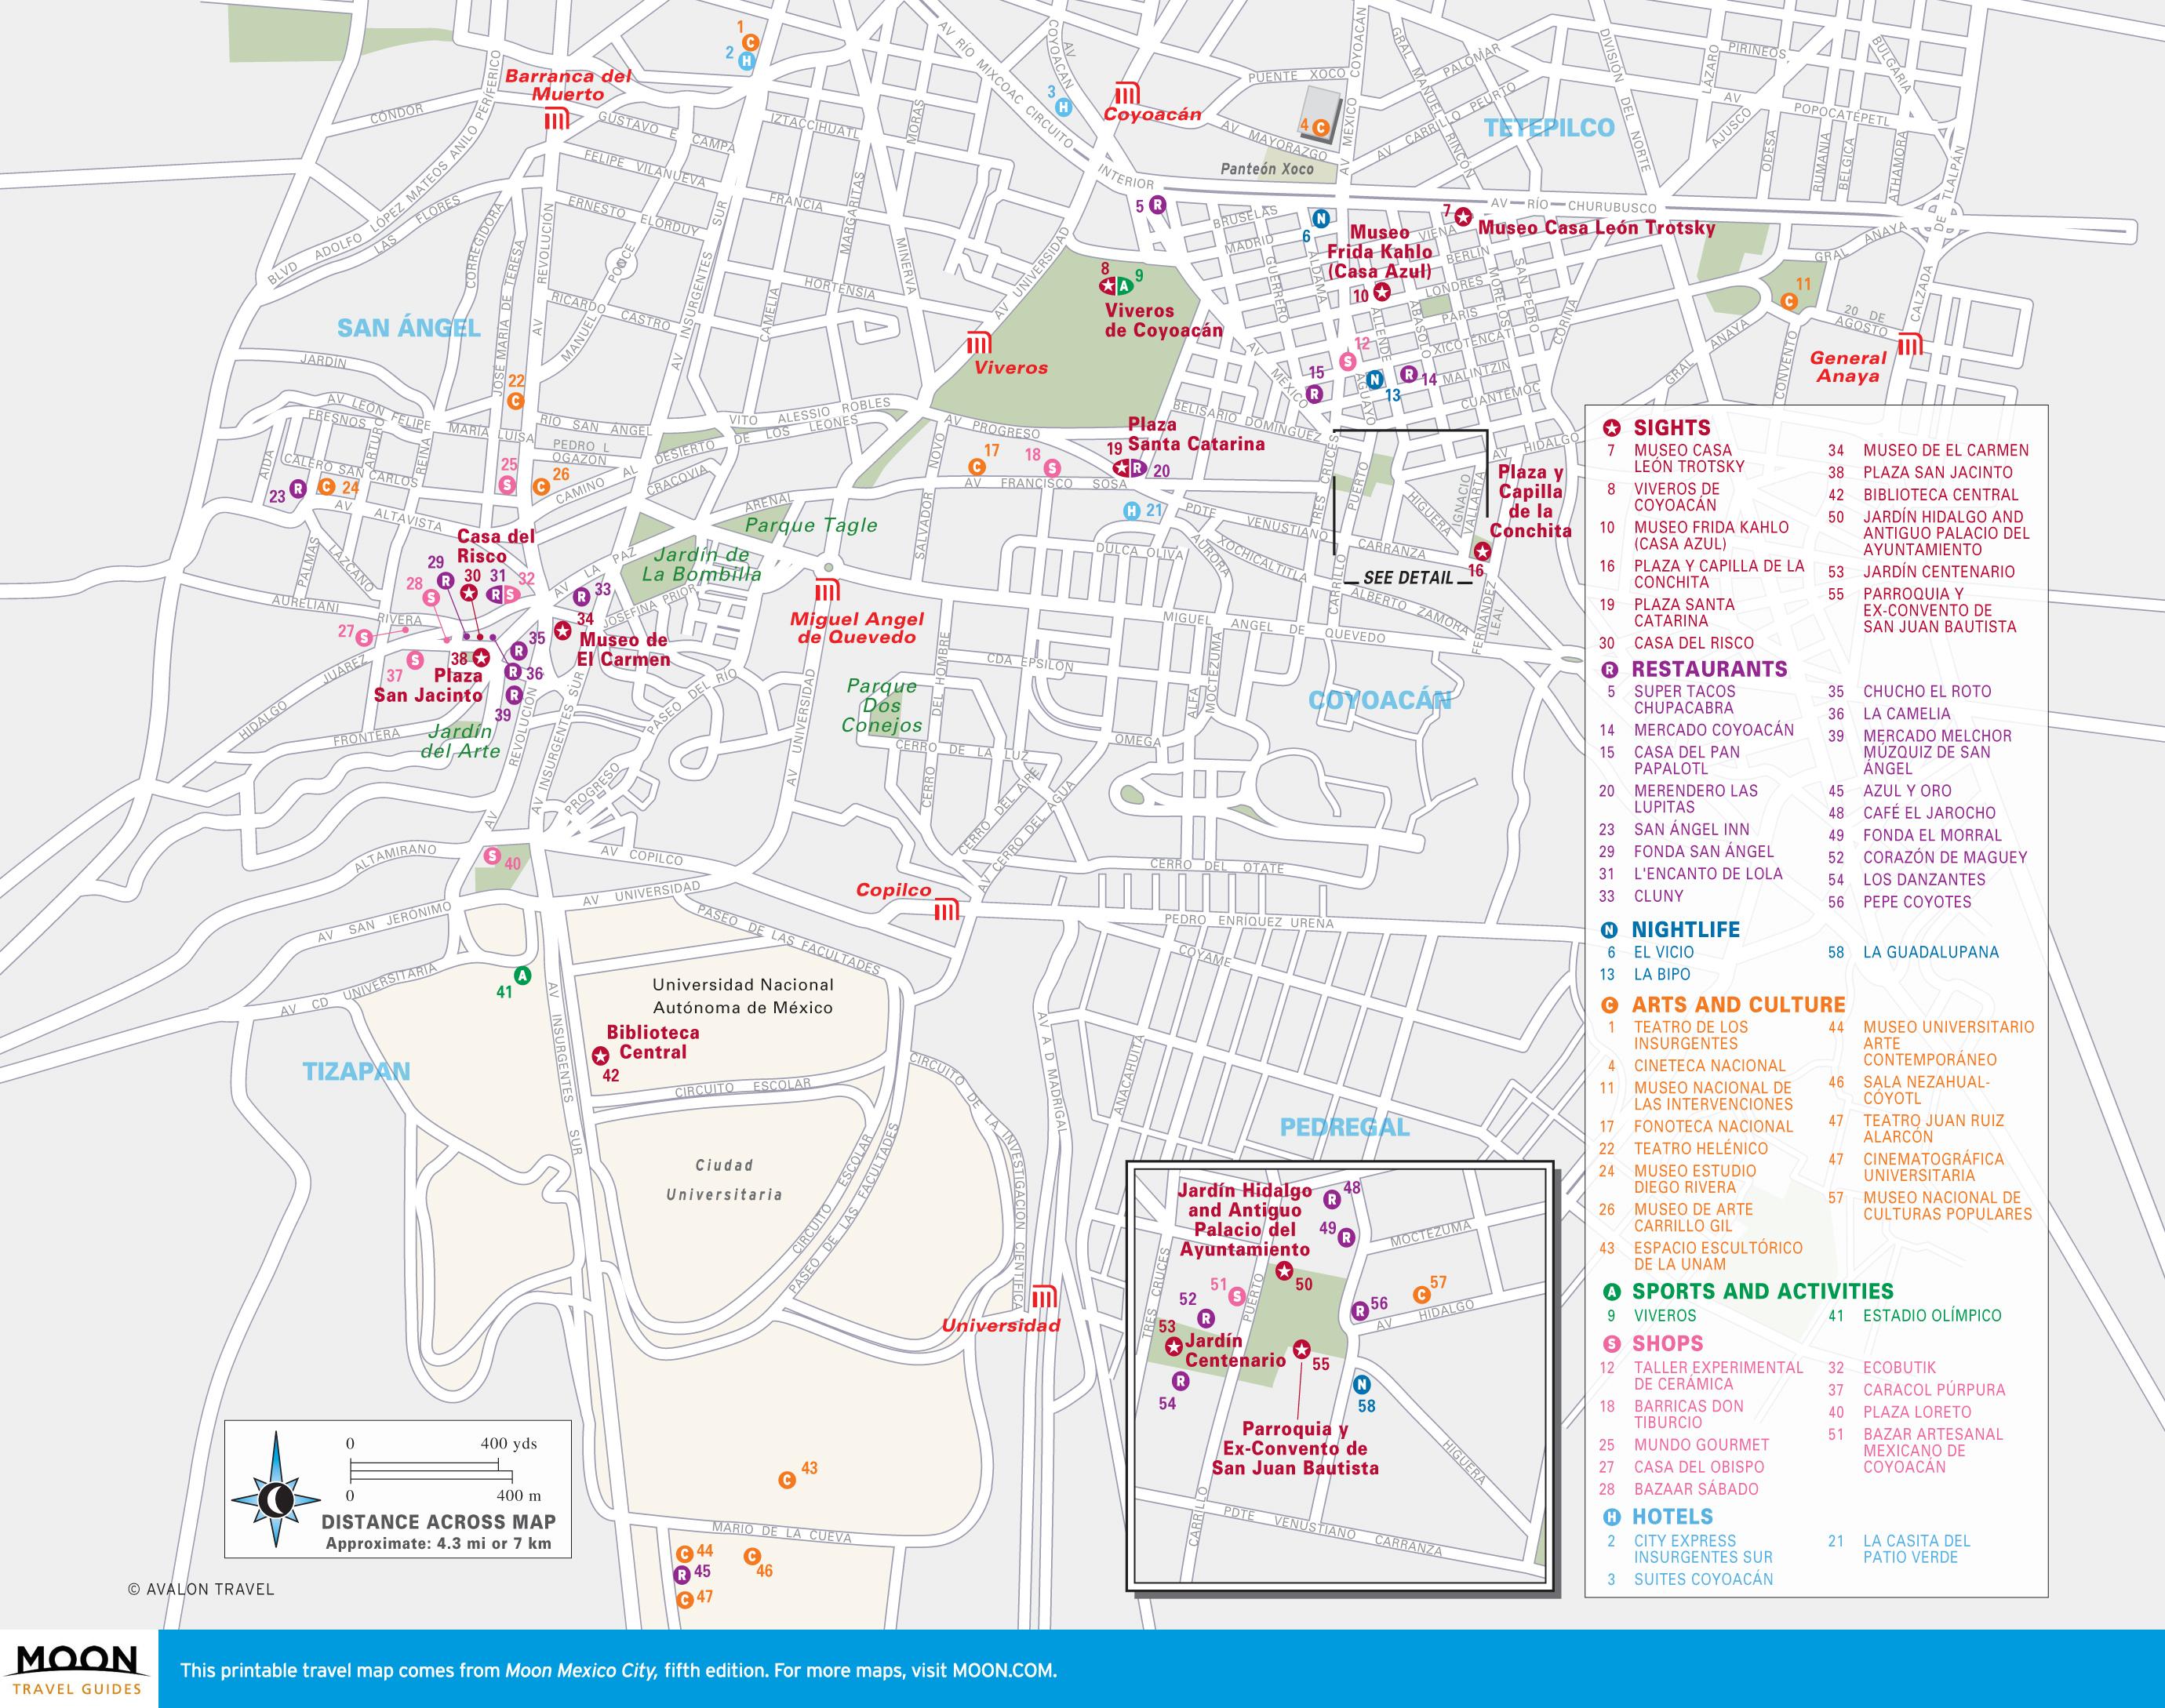 Tourist Map Of Mexico City Printable Travel Maps Of Mexico City - Printable Map Of Mexico City